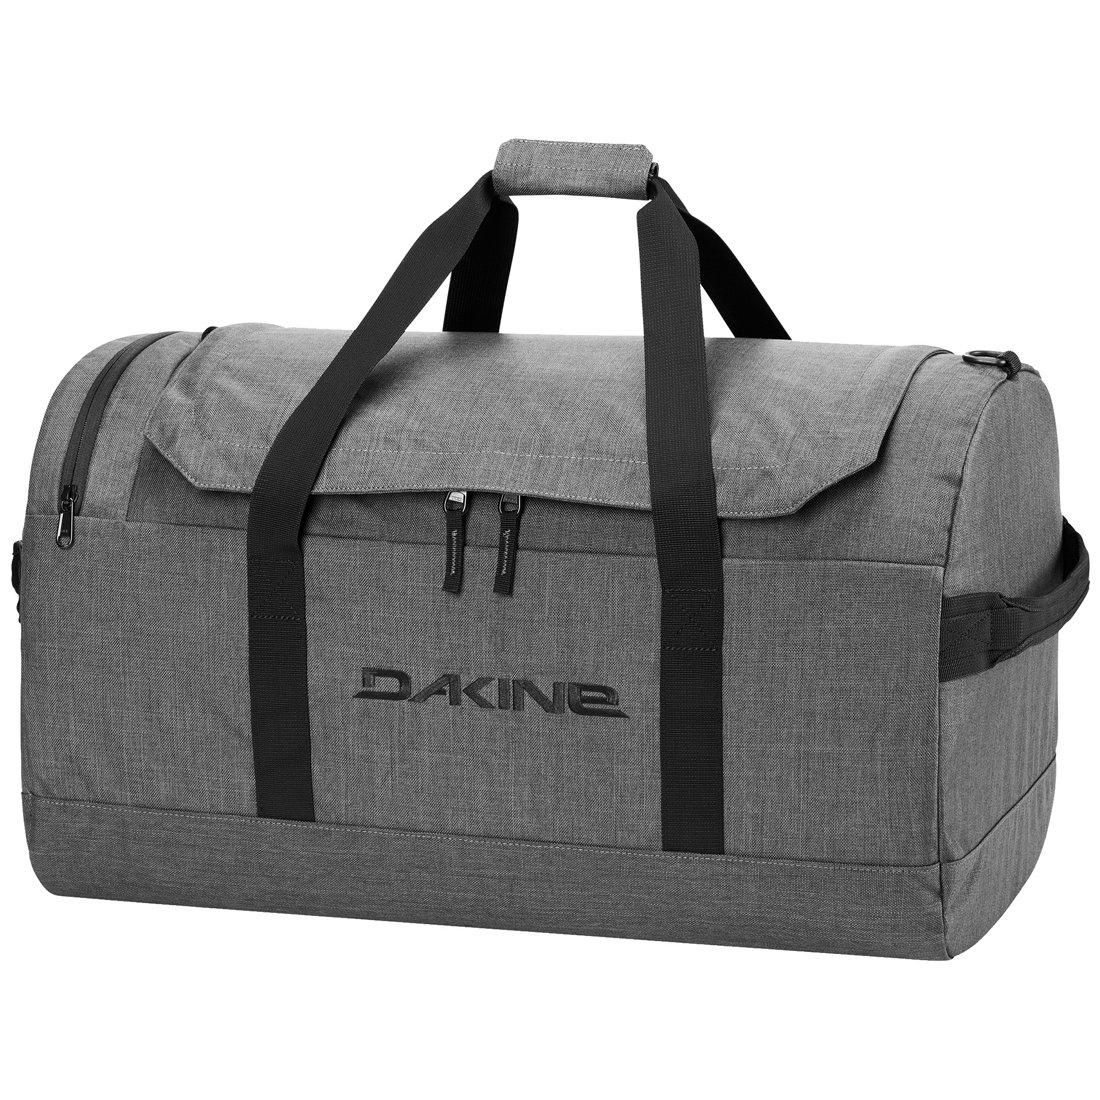 cd839dedf9f77 Dakine Packs   Bags EQ Duffle 70L Reisetasche 61 cm - koffer-direkt.de